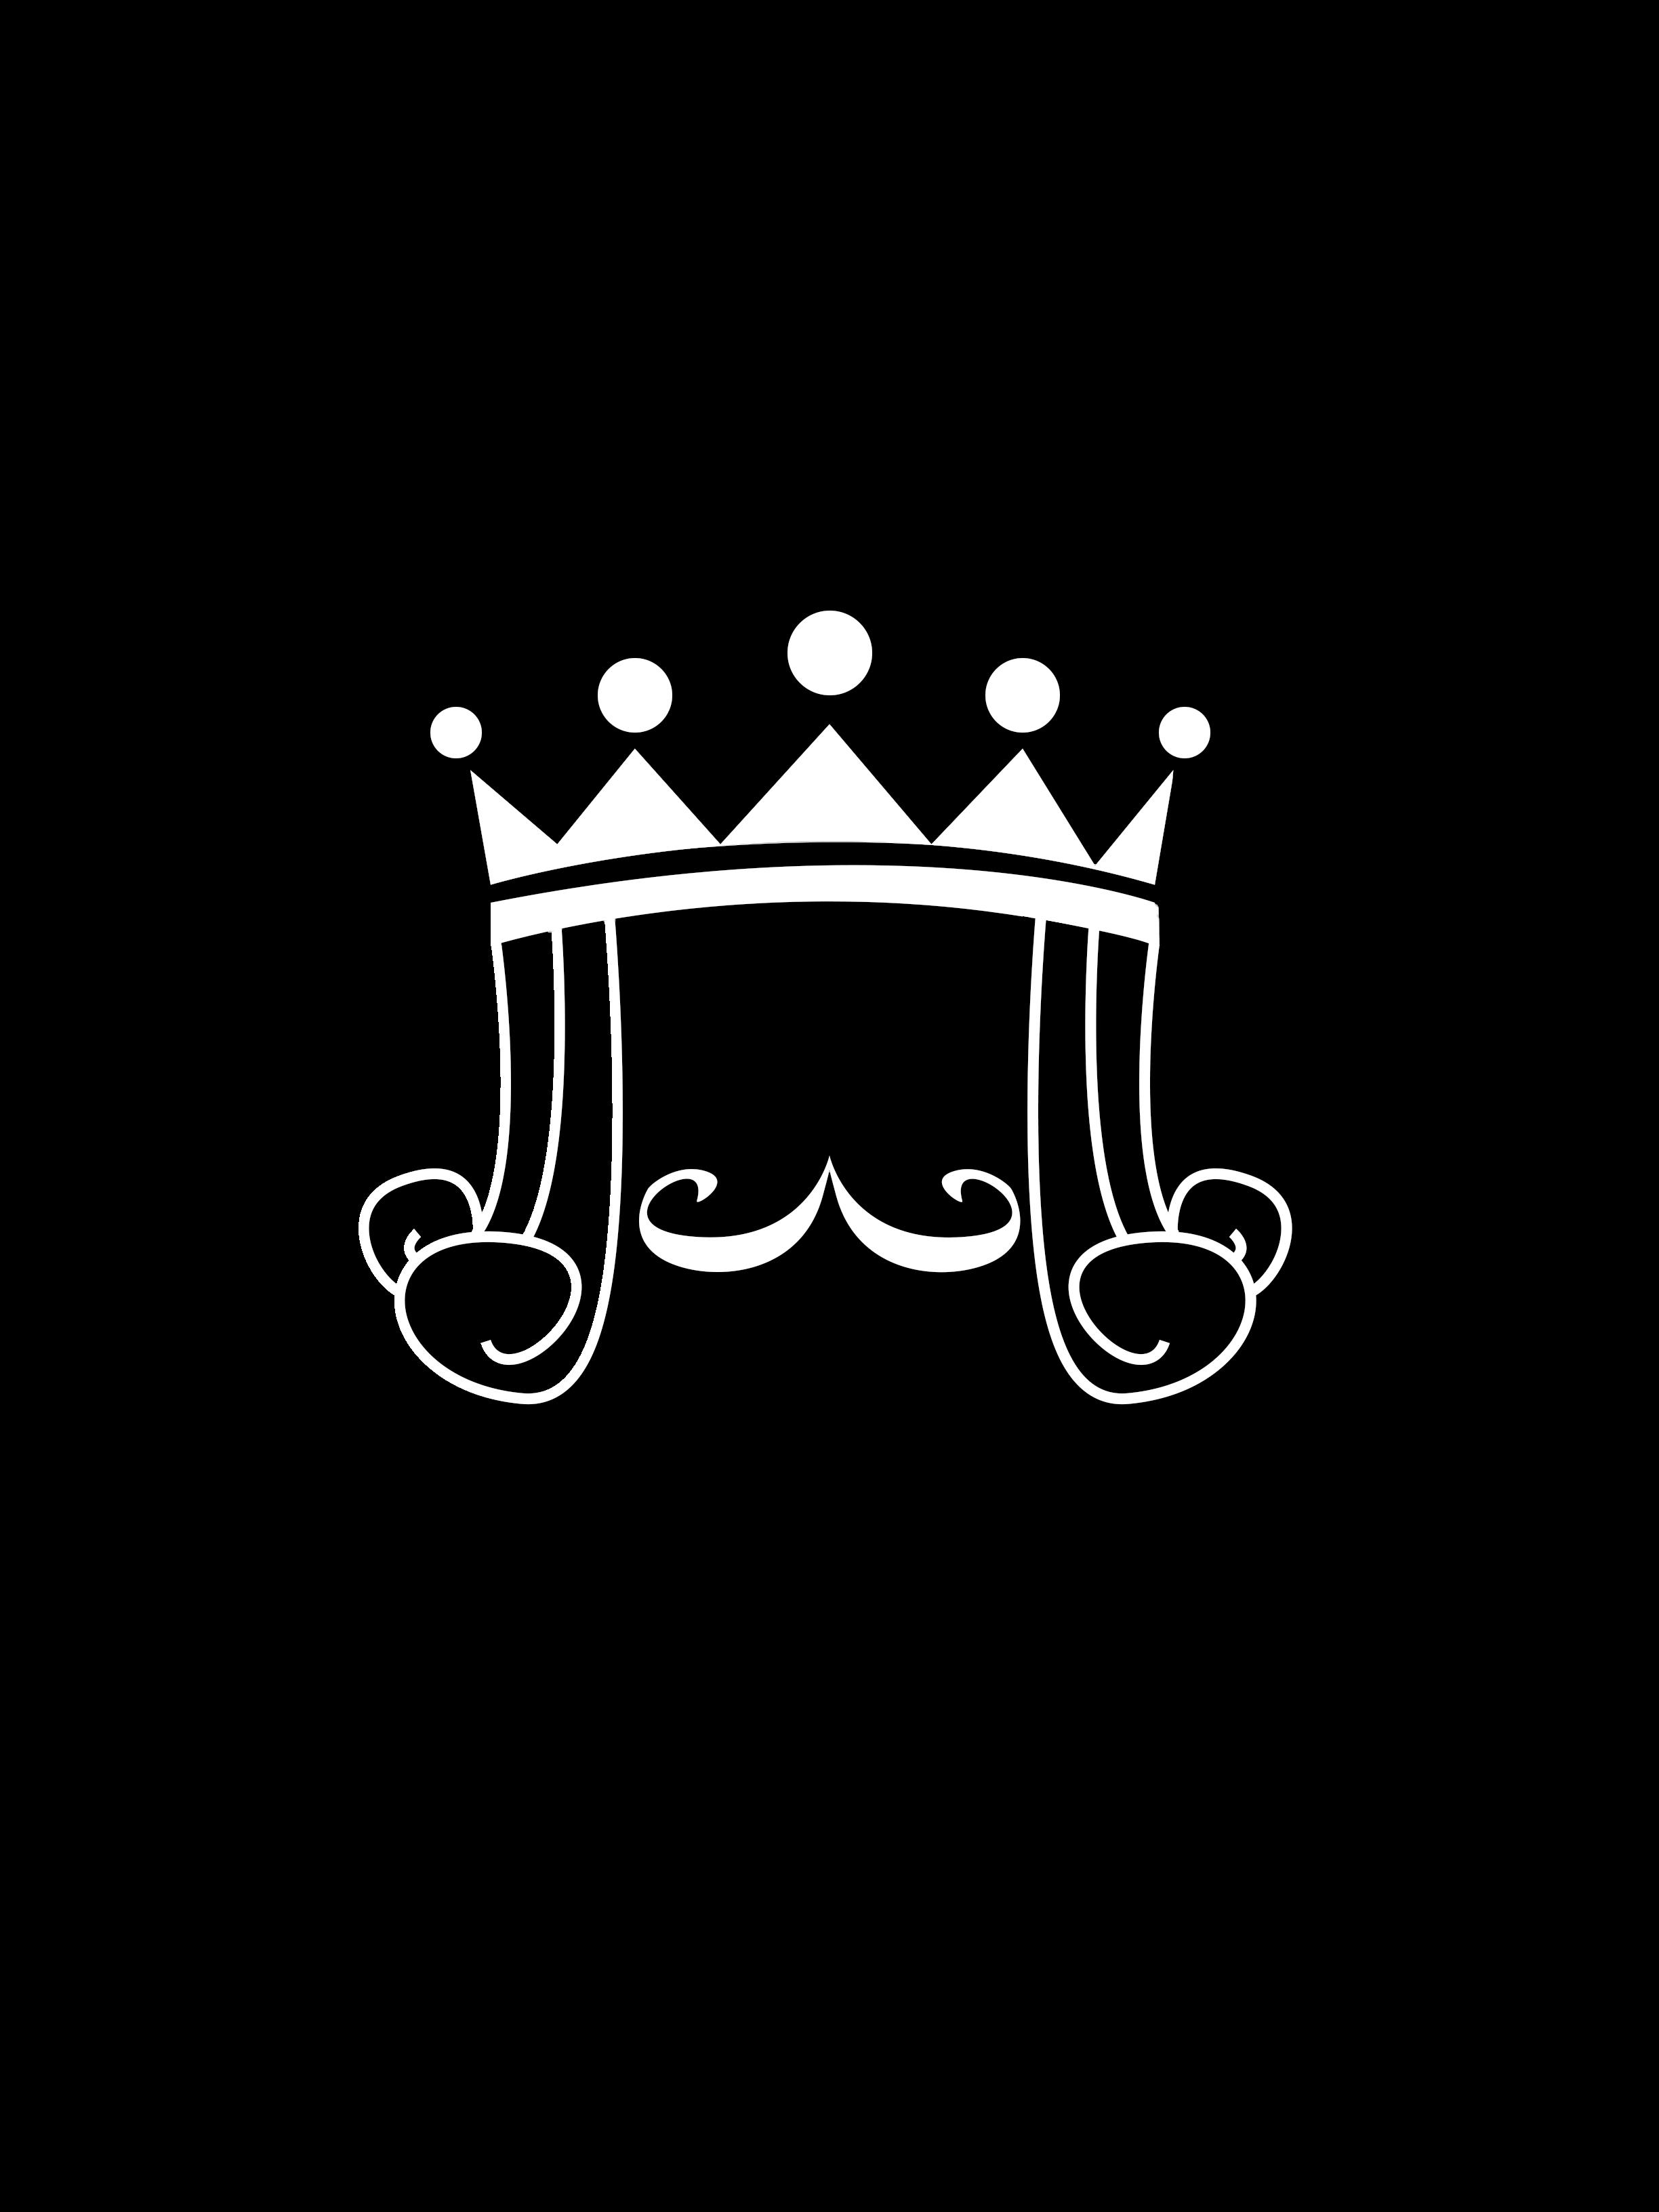 克拉工作室logo